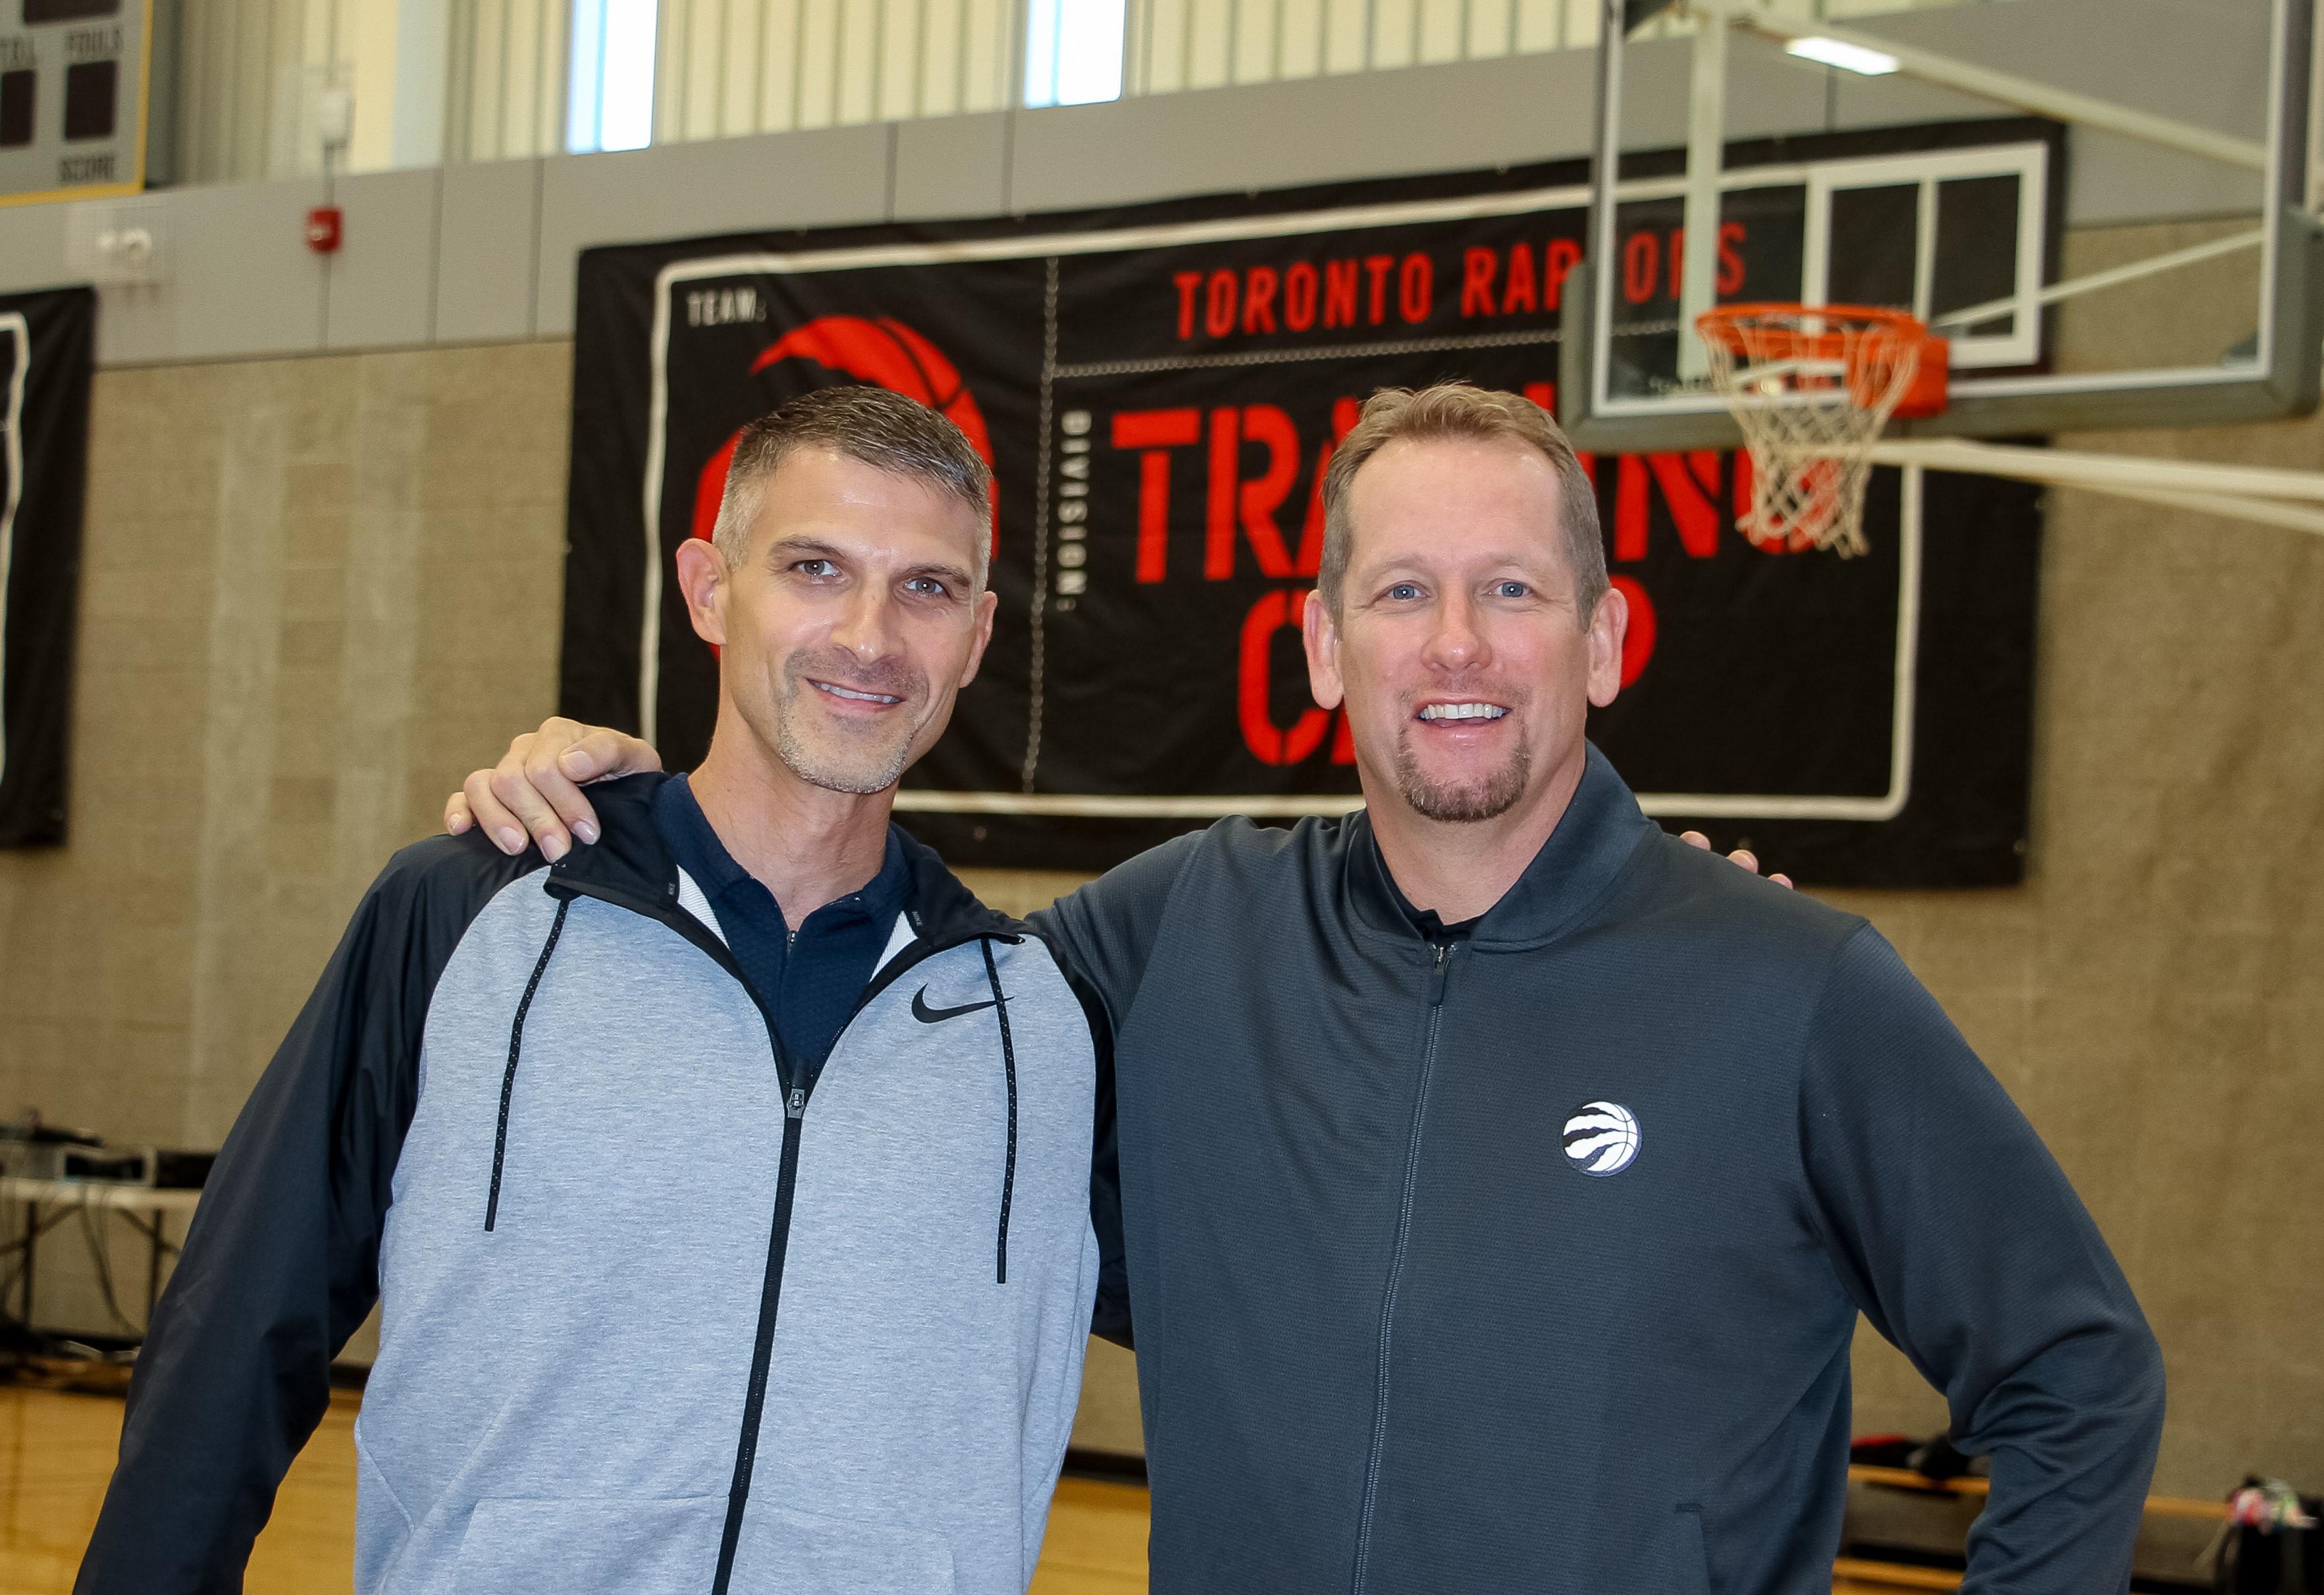 Sport Business academic visits Toronto Raptors training camp